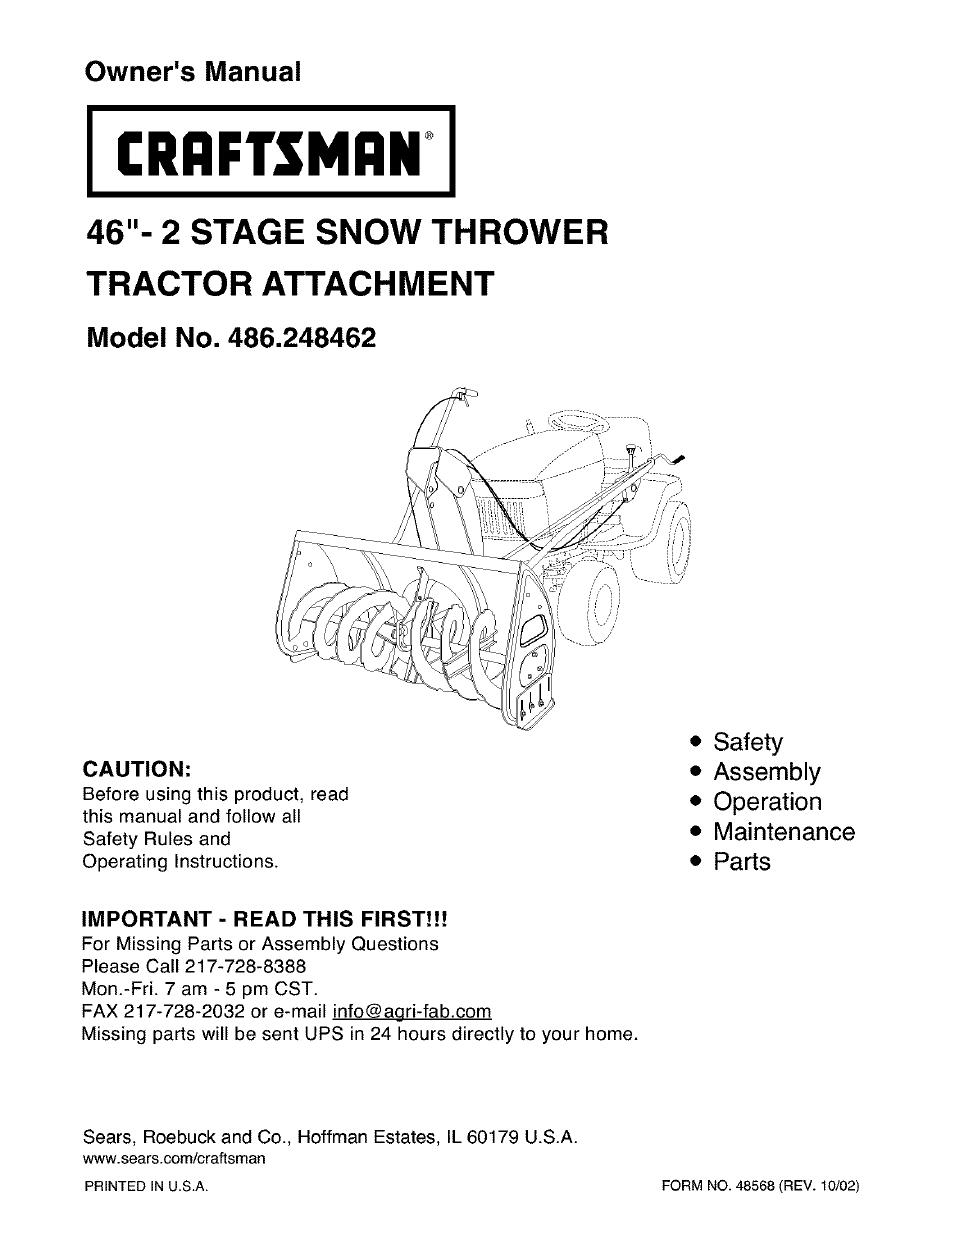 Craftsman Snow Thrower Parts Manual : Craftsman user manual pages